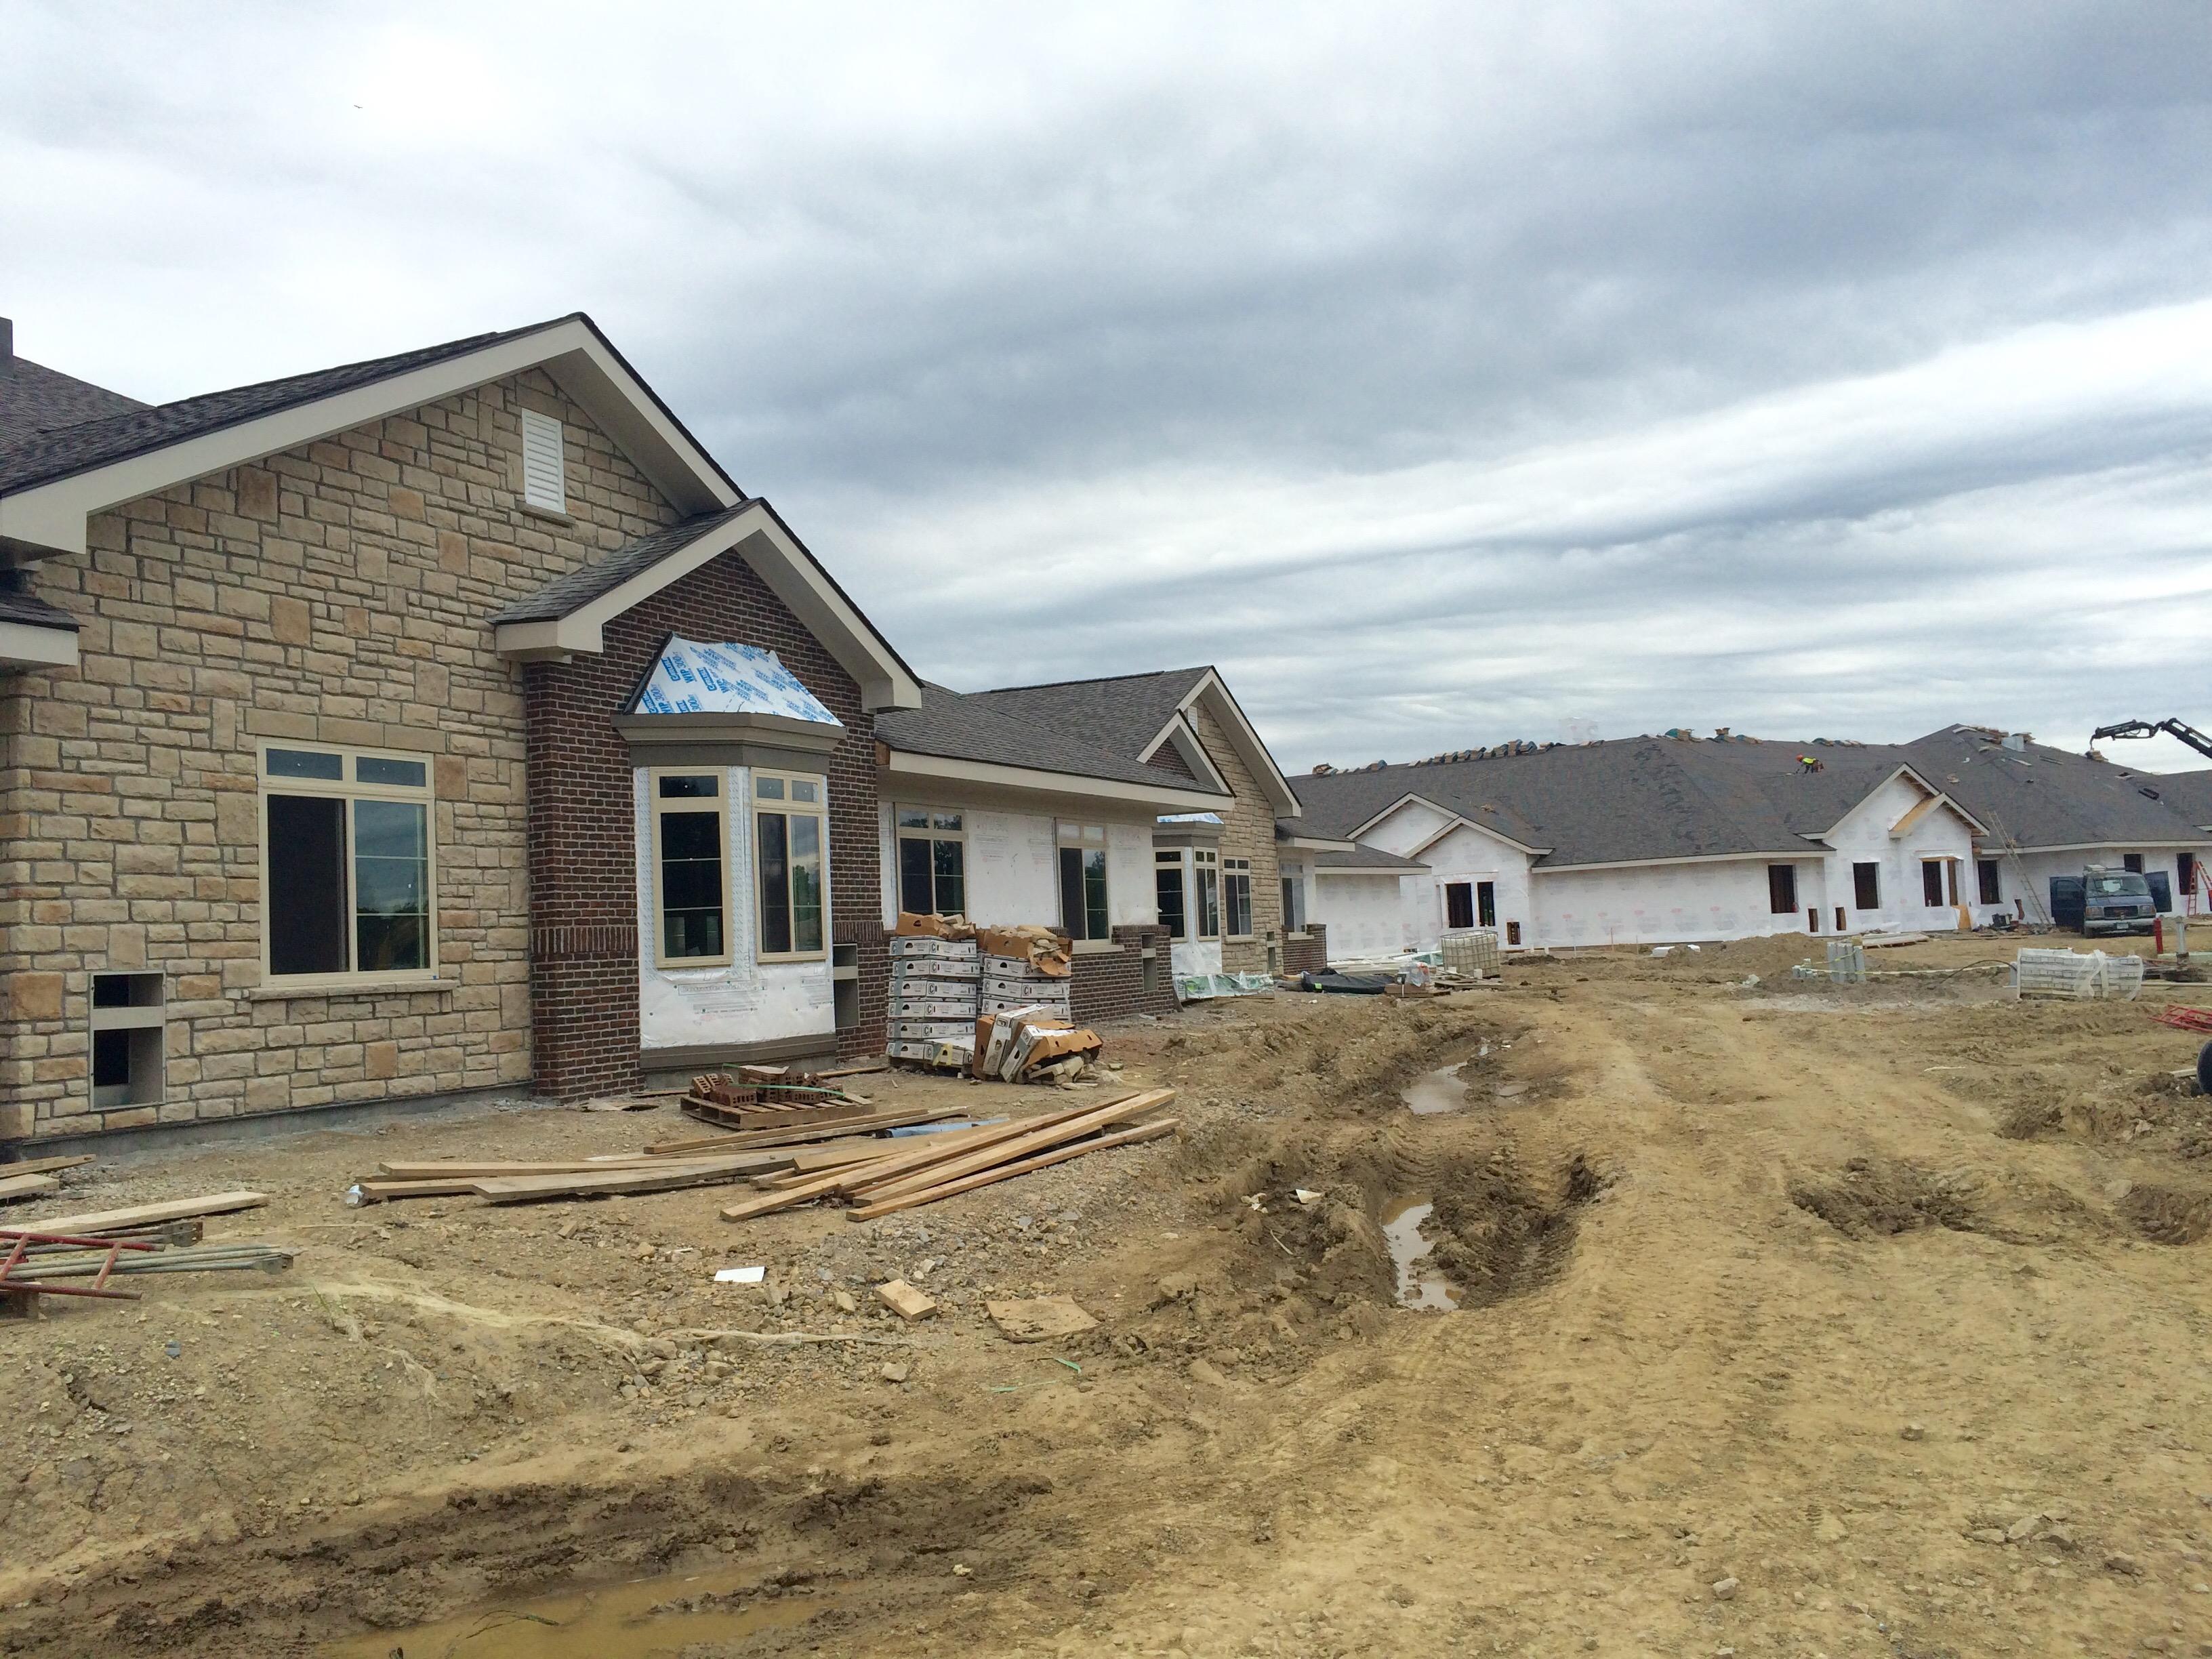 Construction Progress for our Senior Living Center